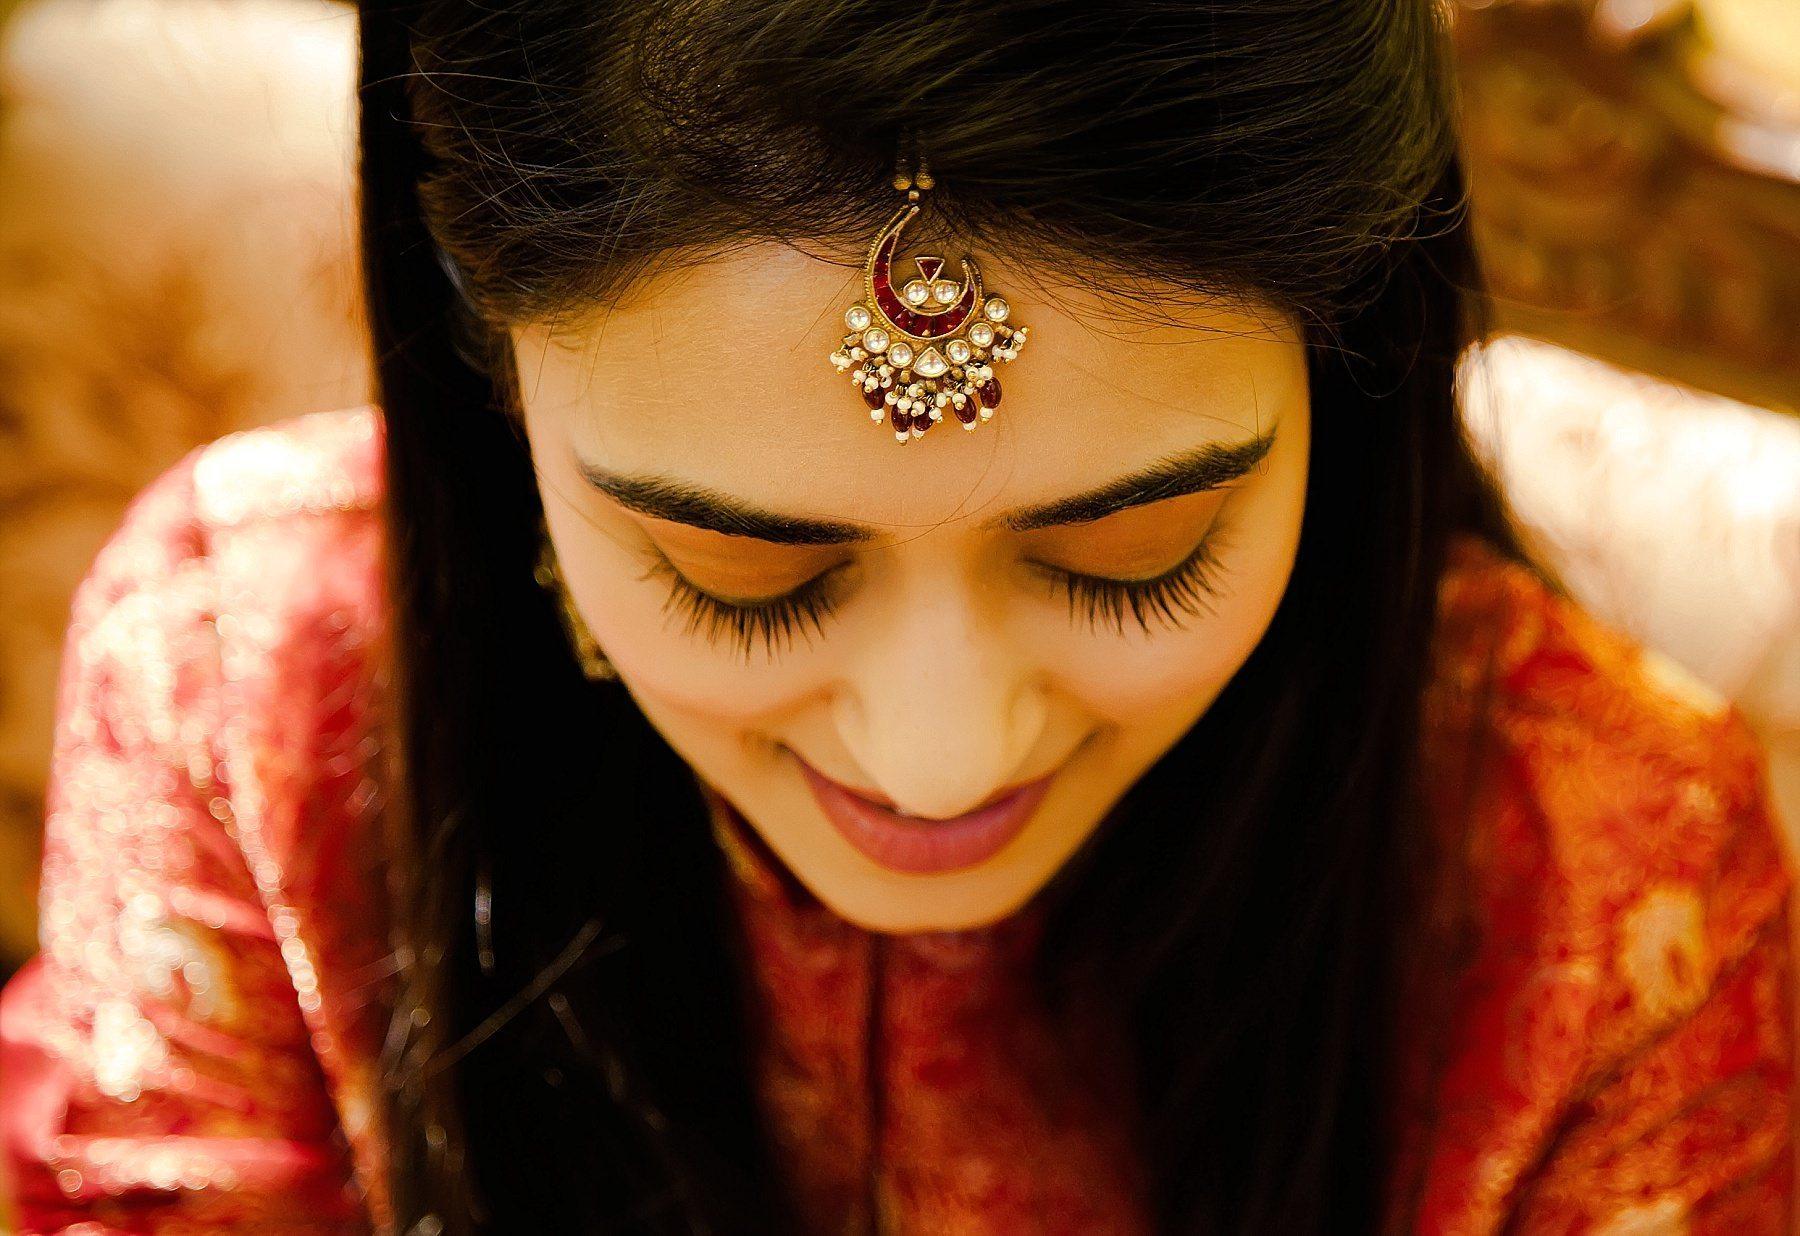 Bridal Mehndi In Ahmedabad : Vibrant colorful mehndi party indian wedding ahmedabad